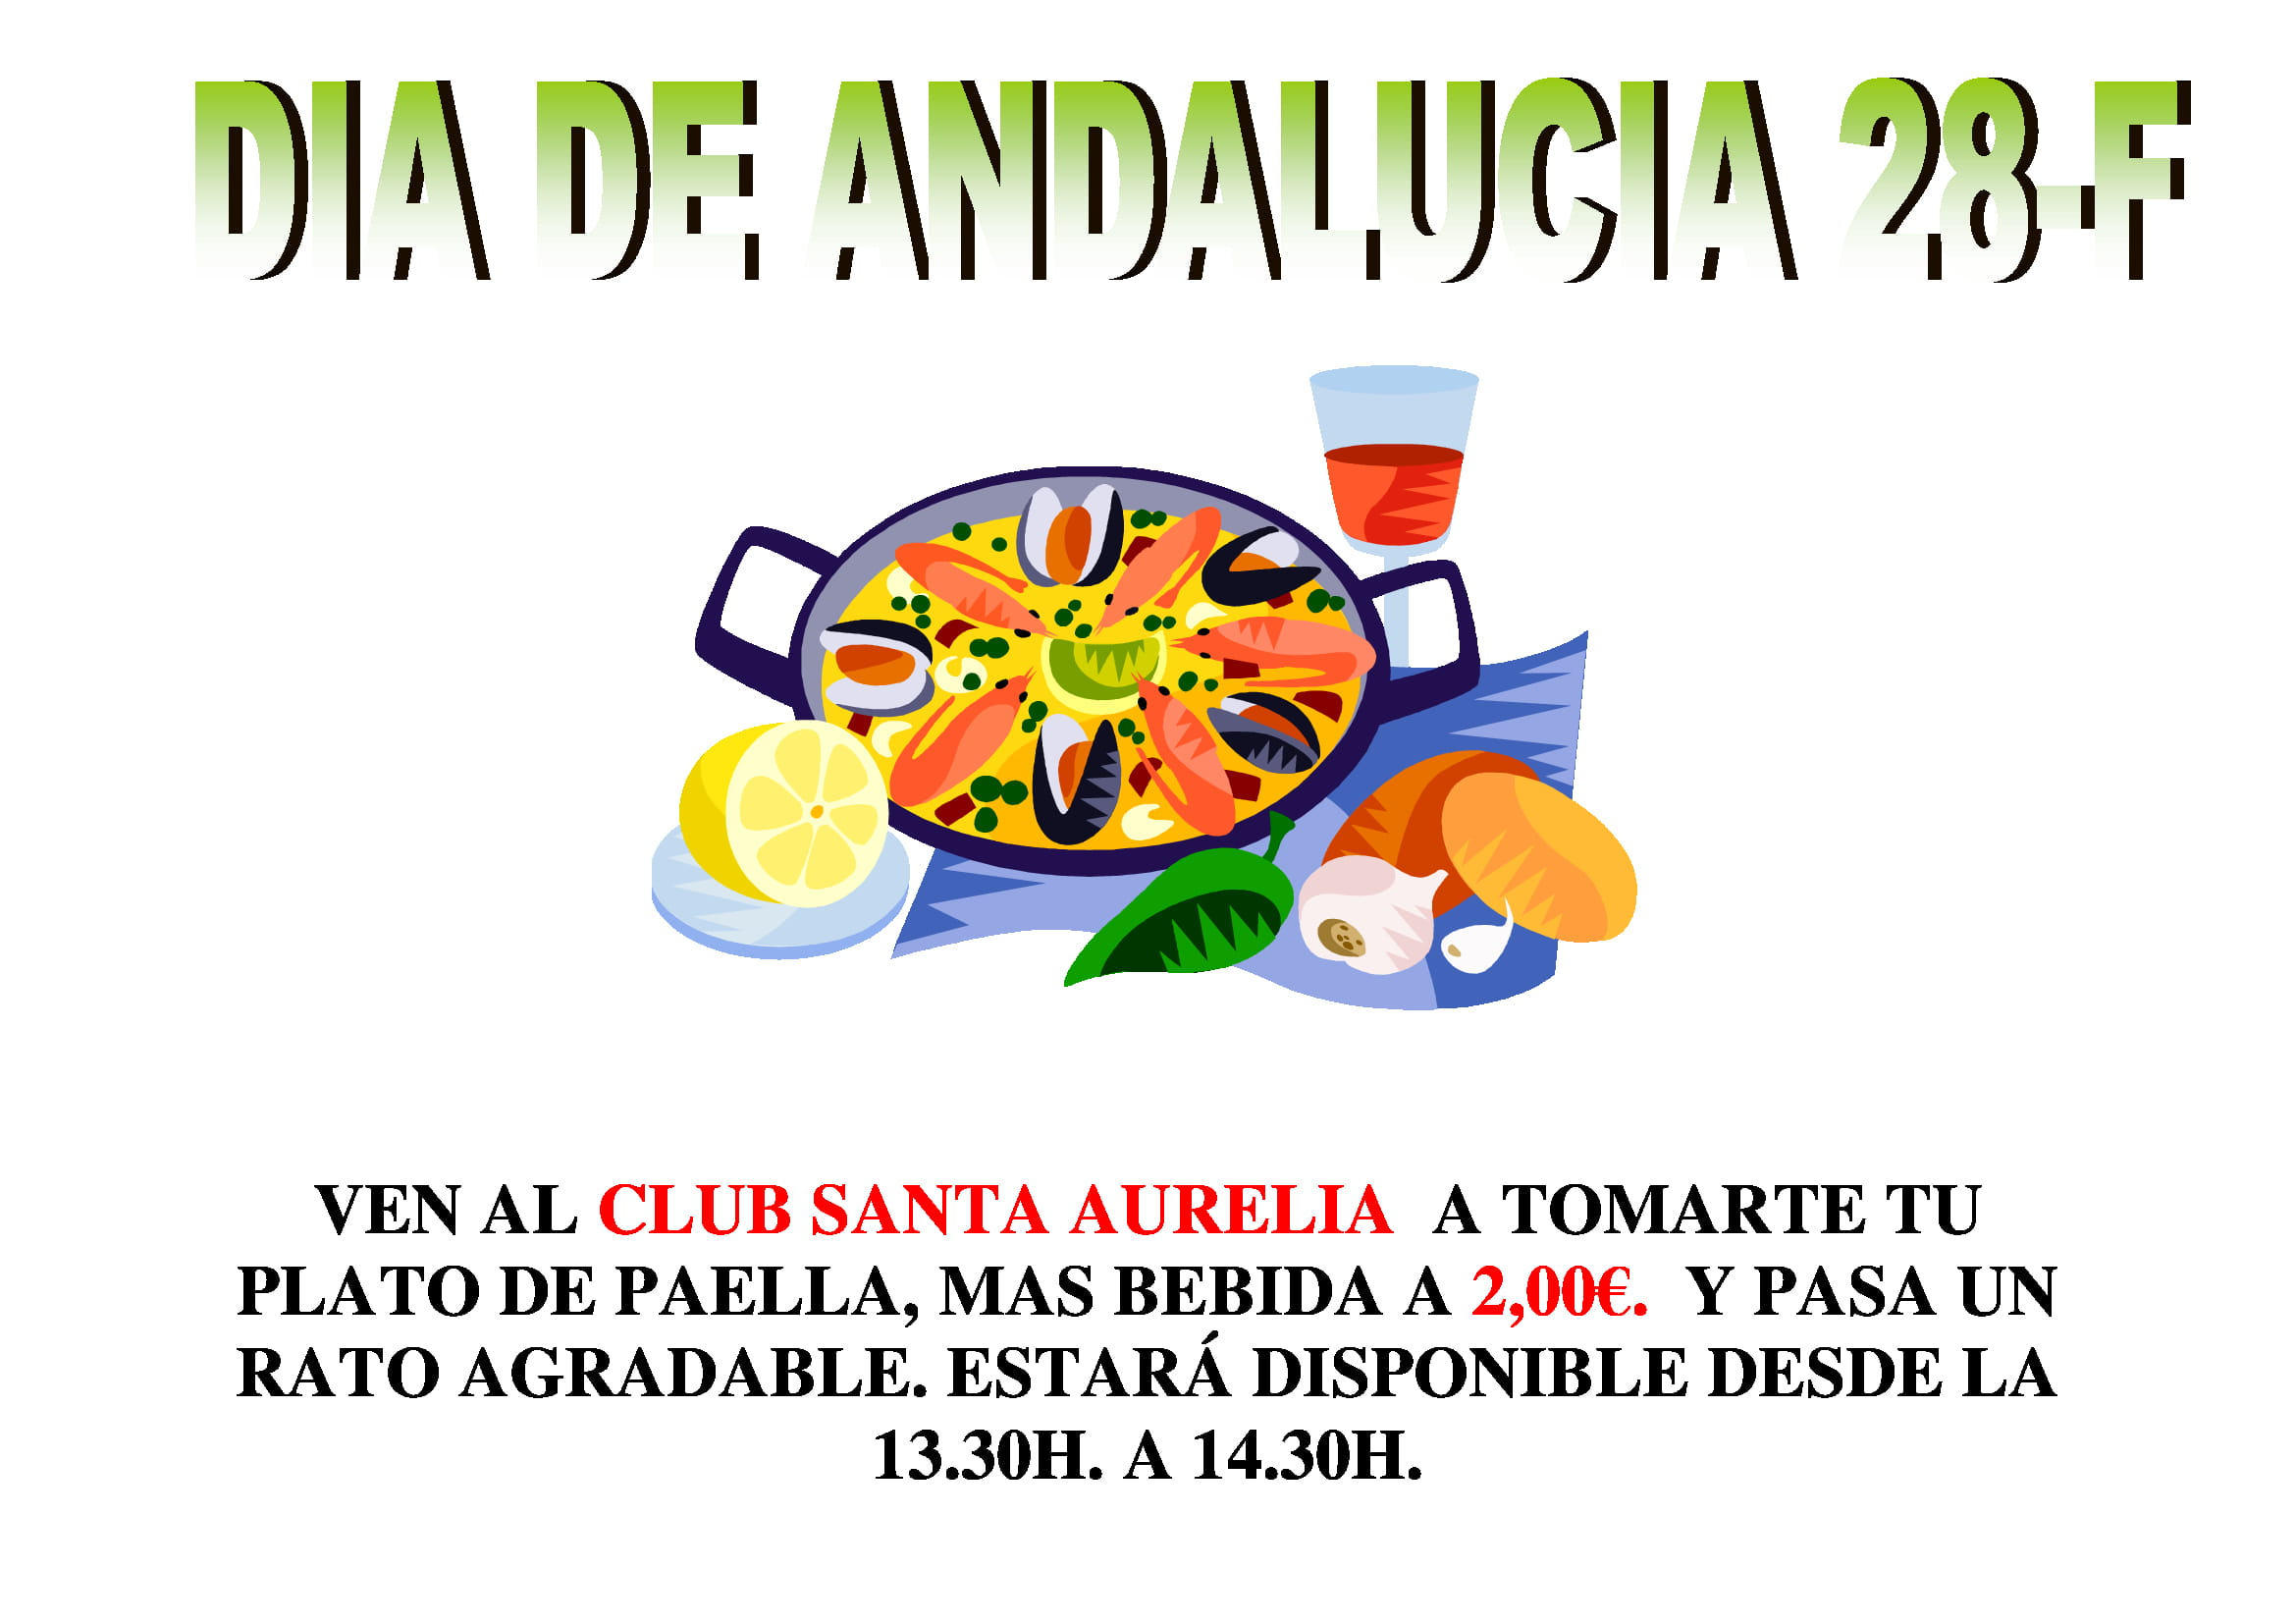 DIA DE ANDALUCIA 19 1